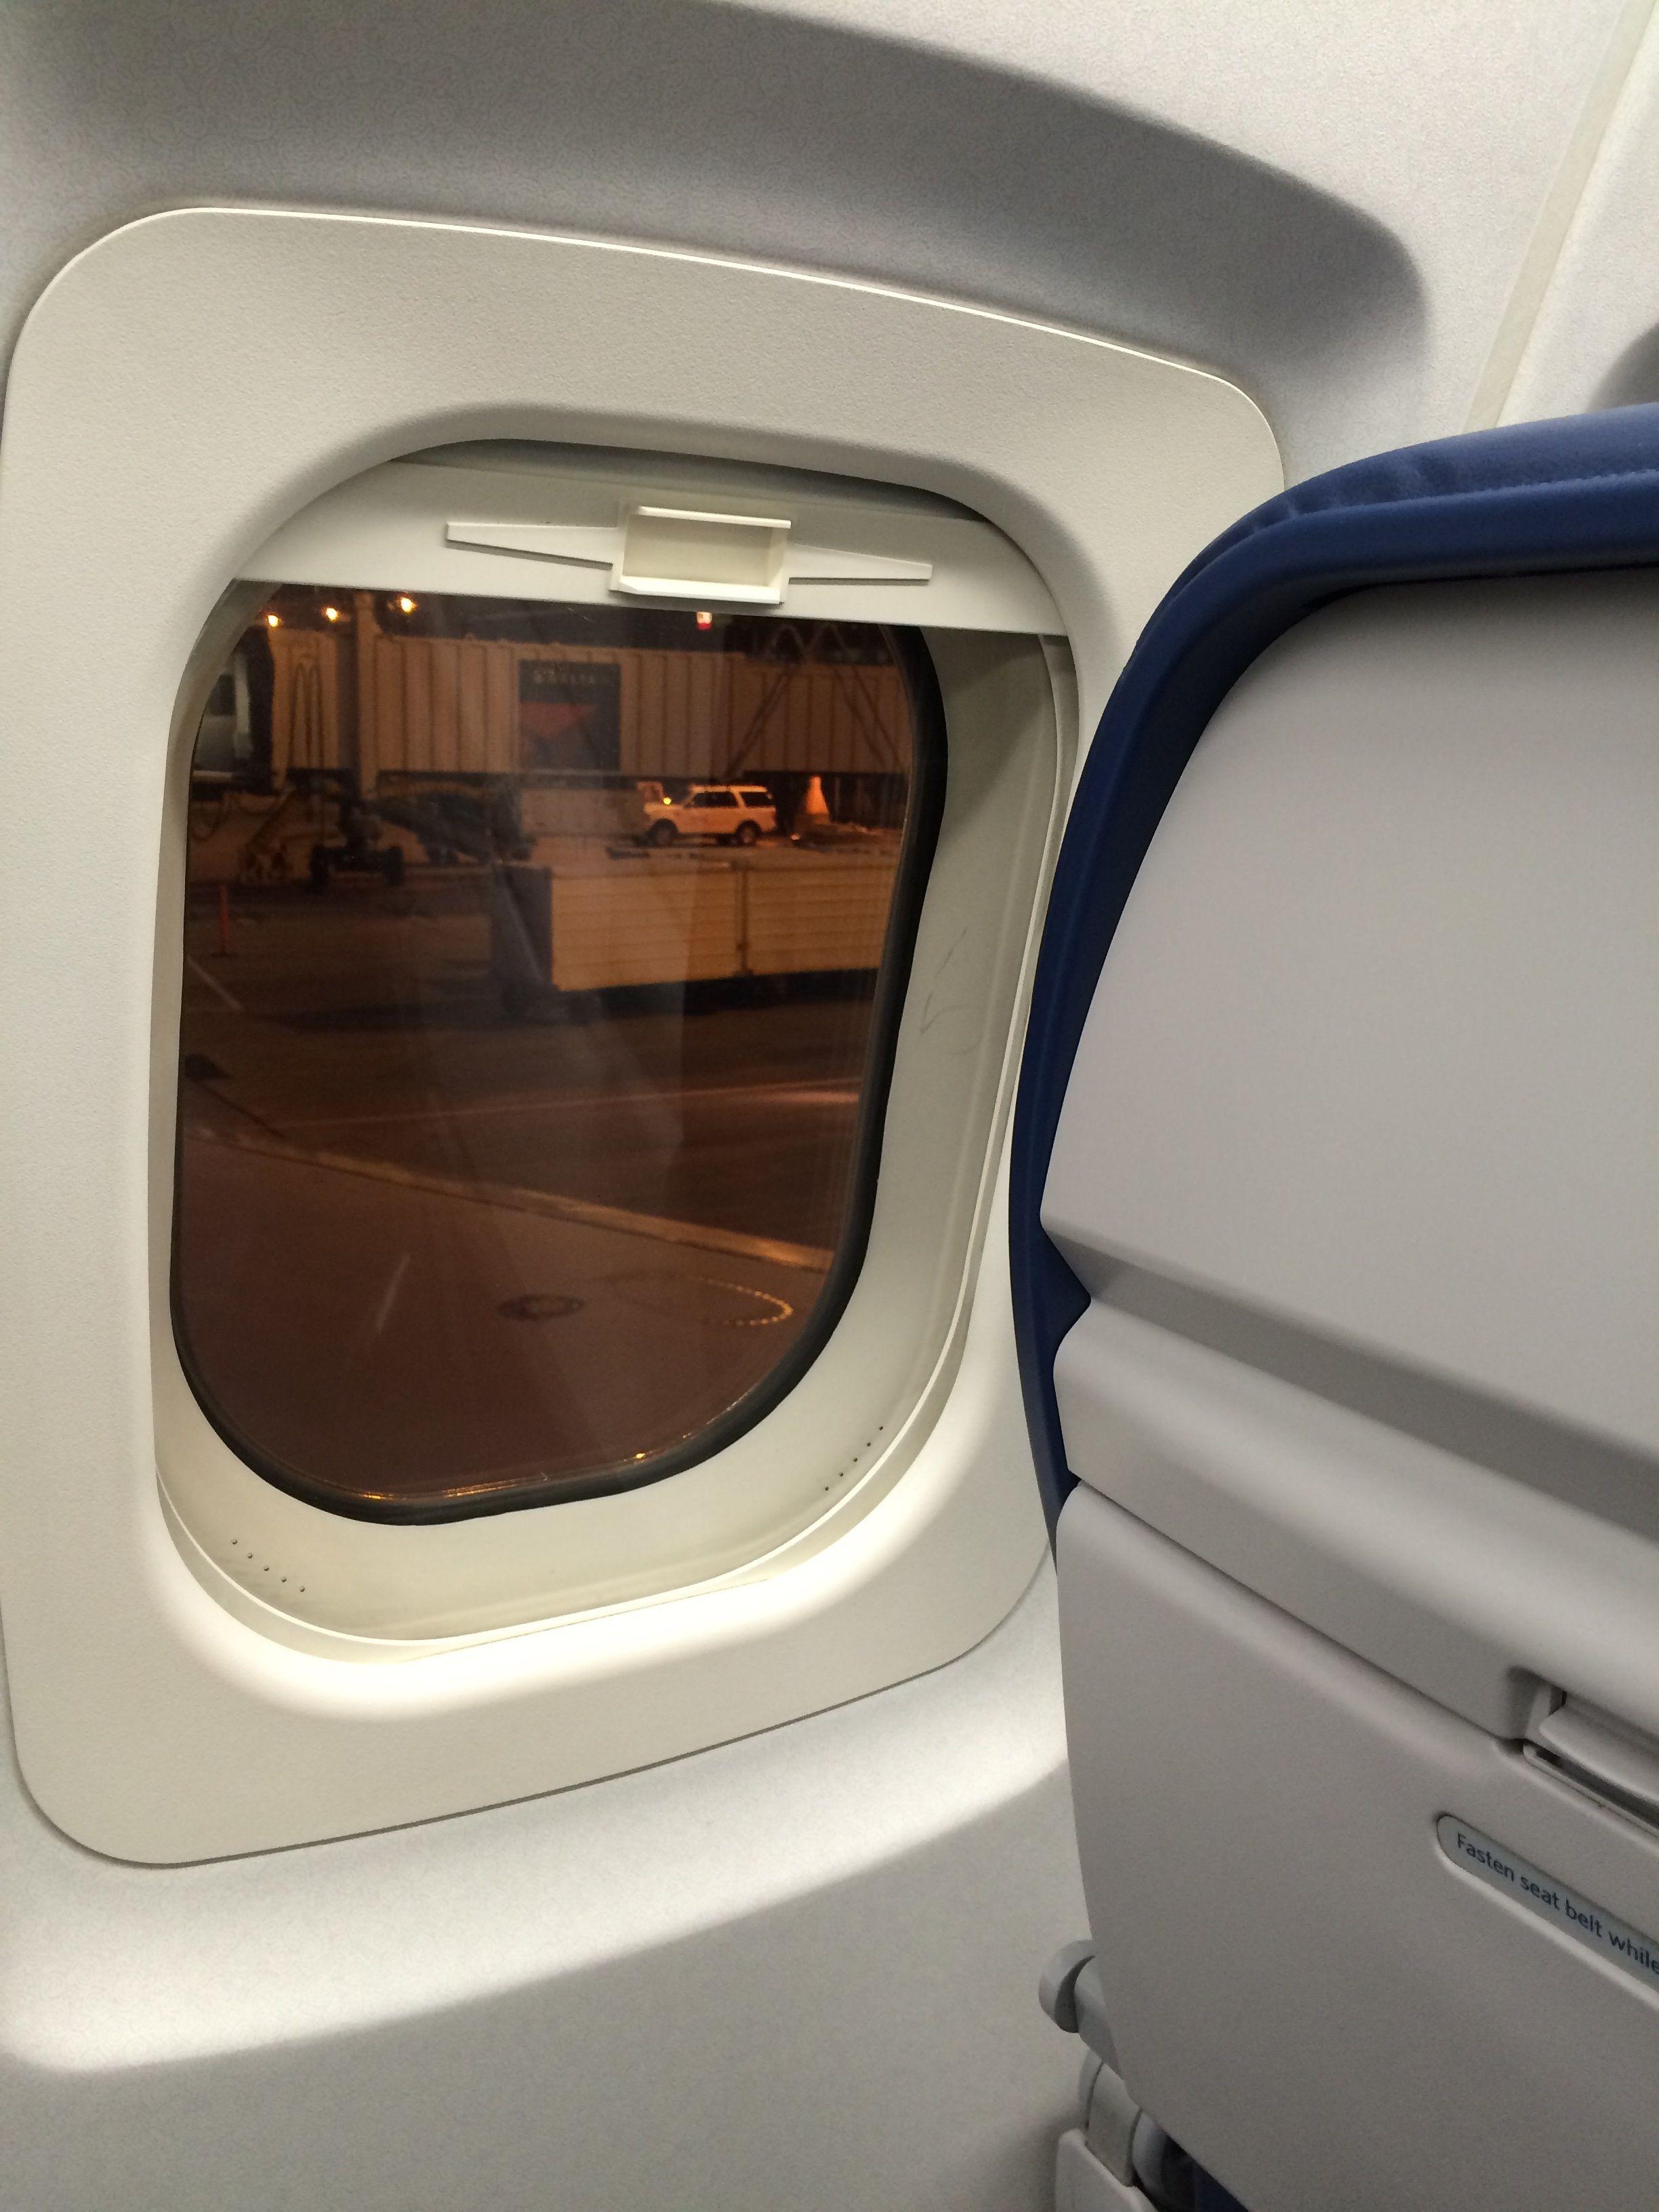 Pleasing The Delta Plane Window Seat For My 10 30 14 Flight To Machost Co Dining Chair Design Ideas Machostcouk